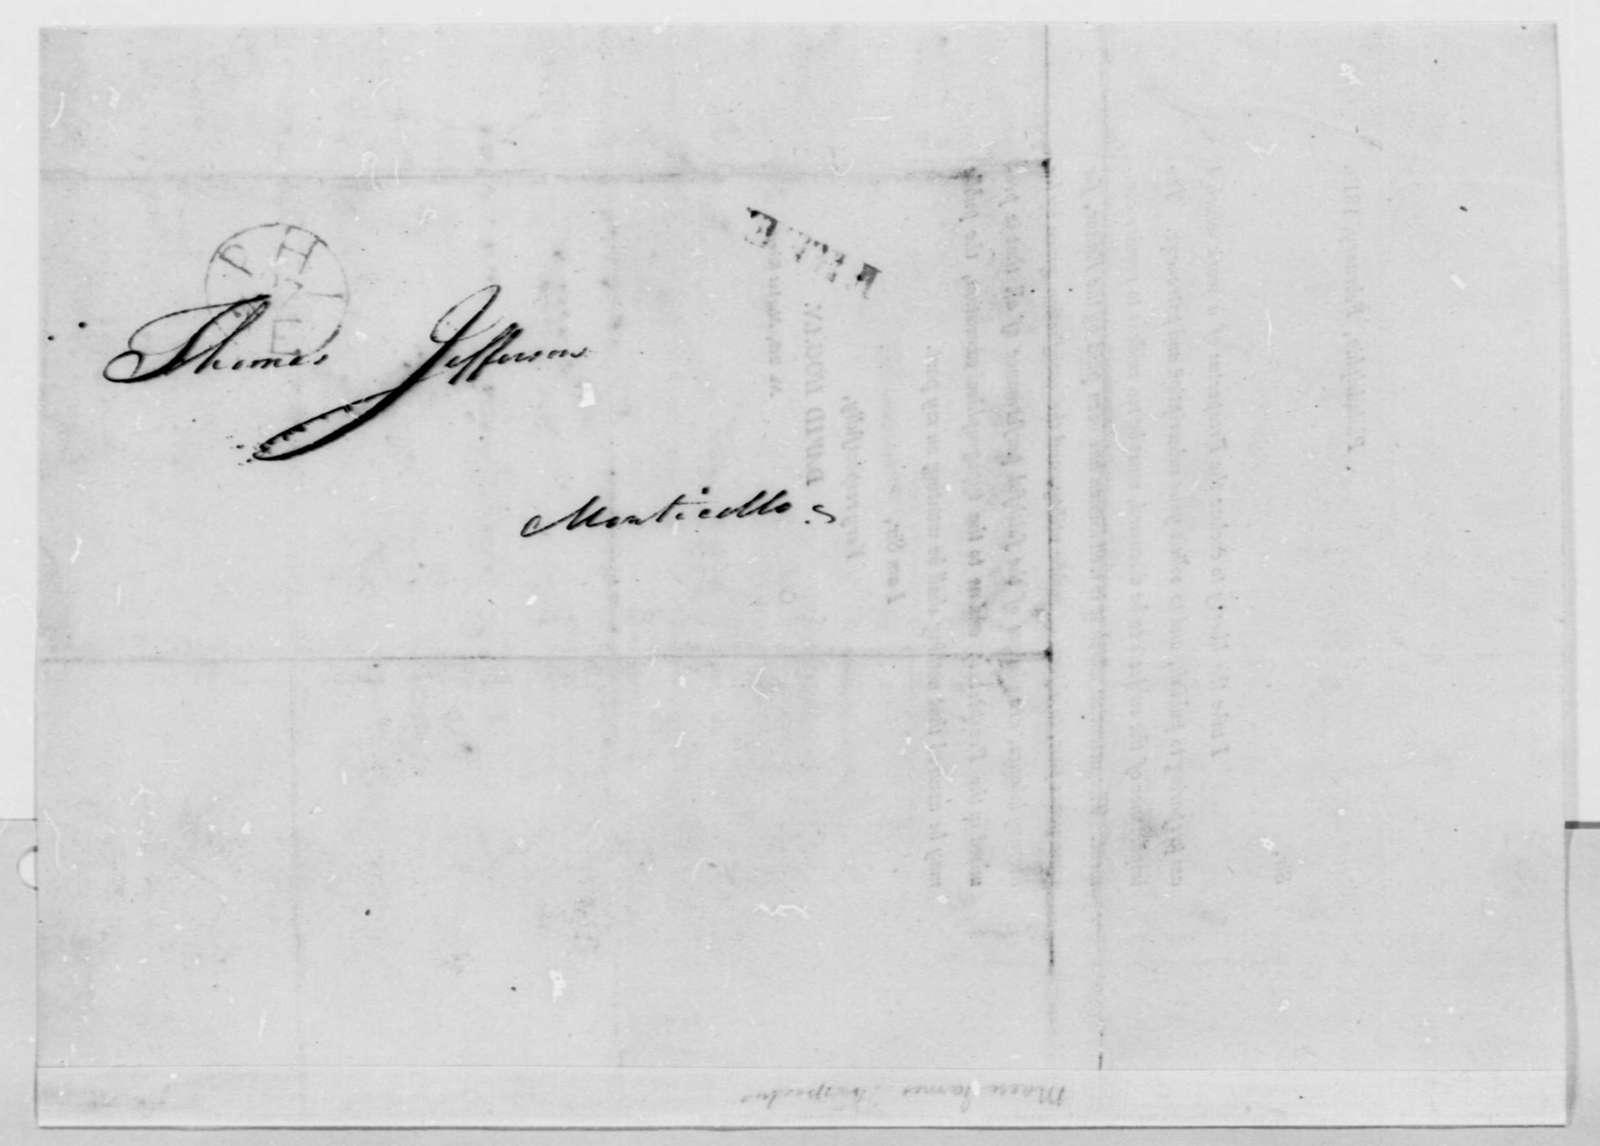 David Hogan to Thomas Jefferson, February 1810, Printed Circular Letter and Prospectus